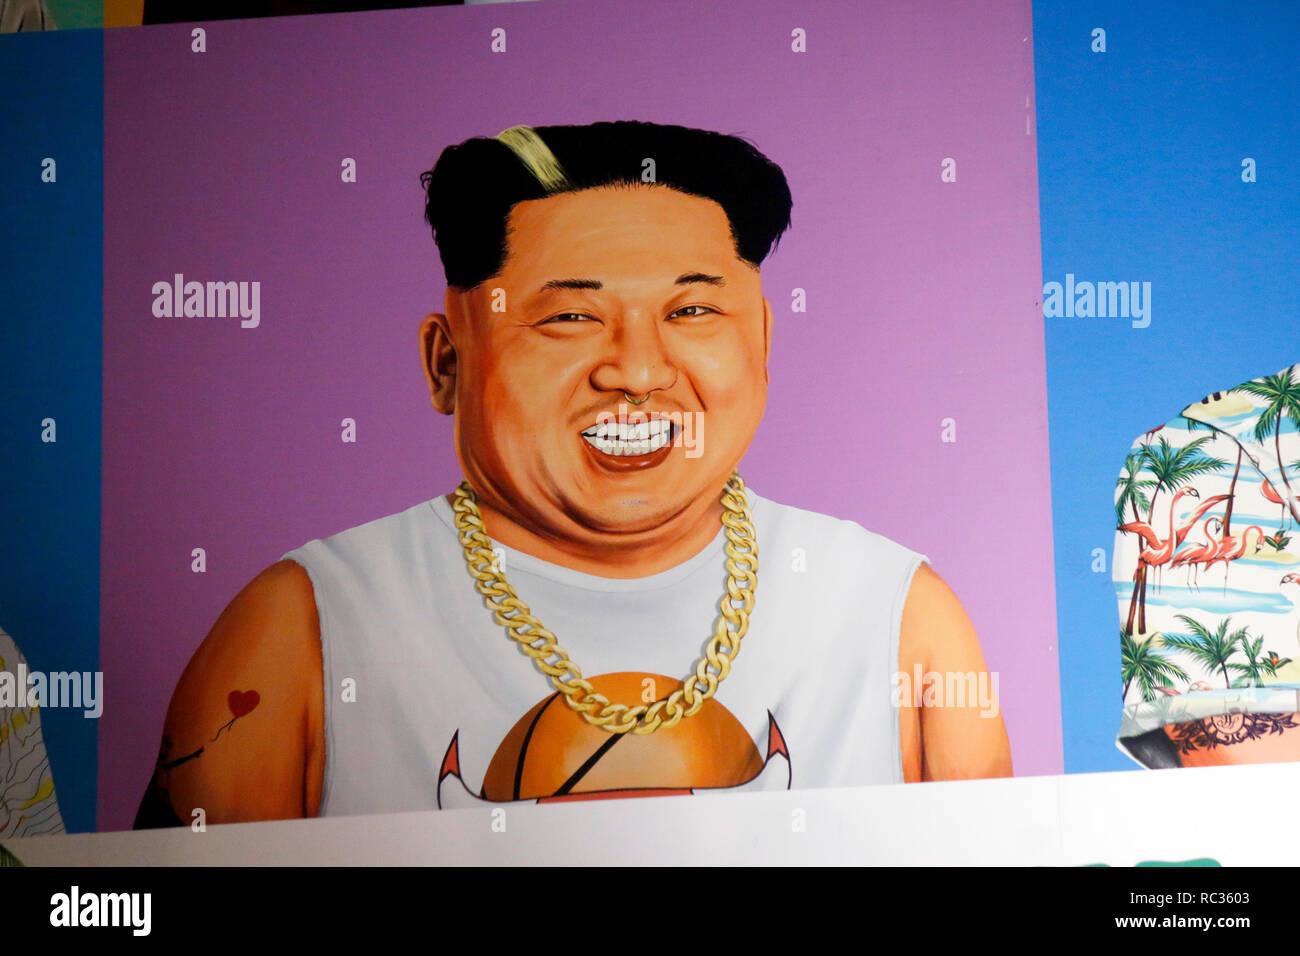 Kim Jong il als Hipster, Tel Aviv, Israel. - Stock Image